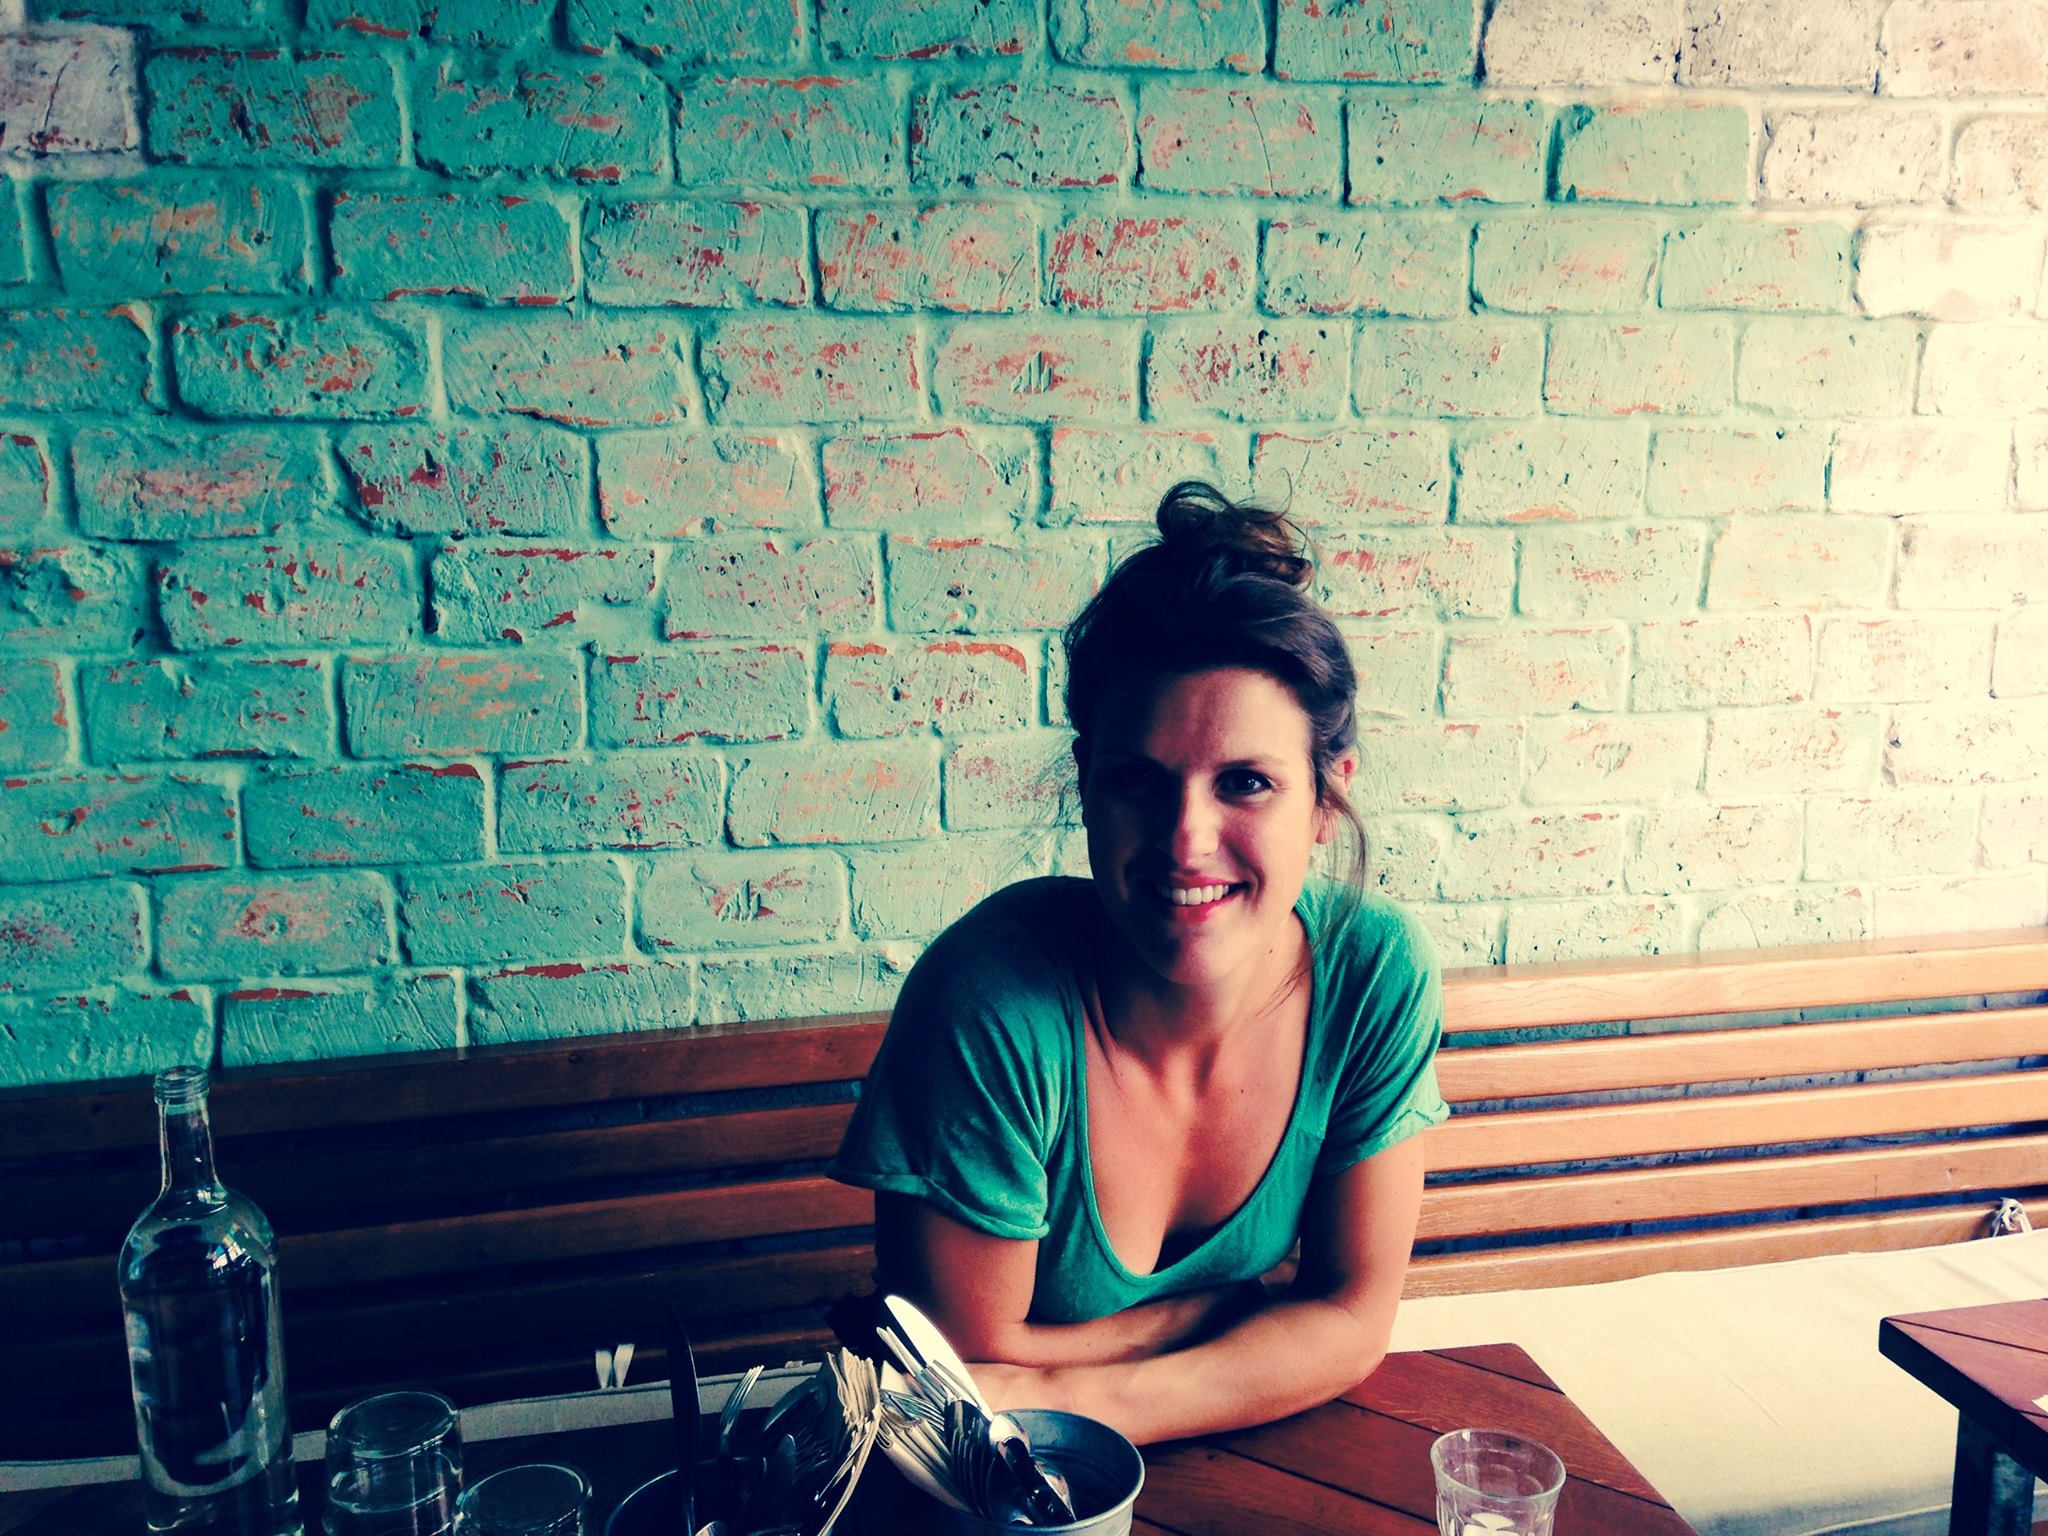 Bartenders at work by Infosbar : le CV express de Jenifer Foulard